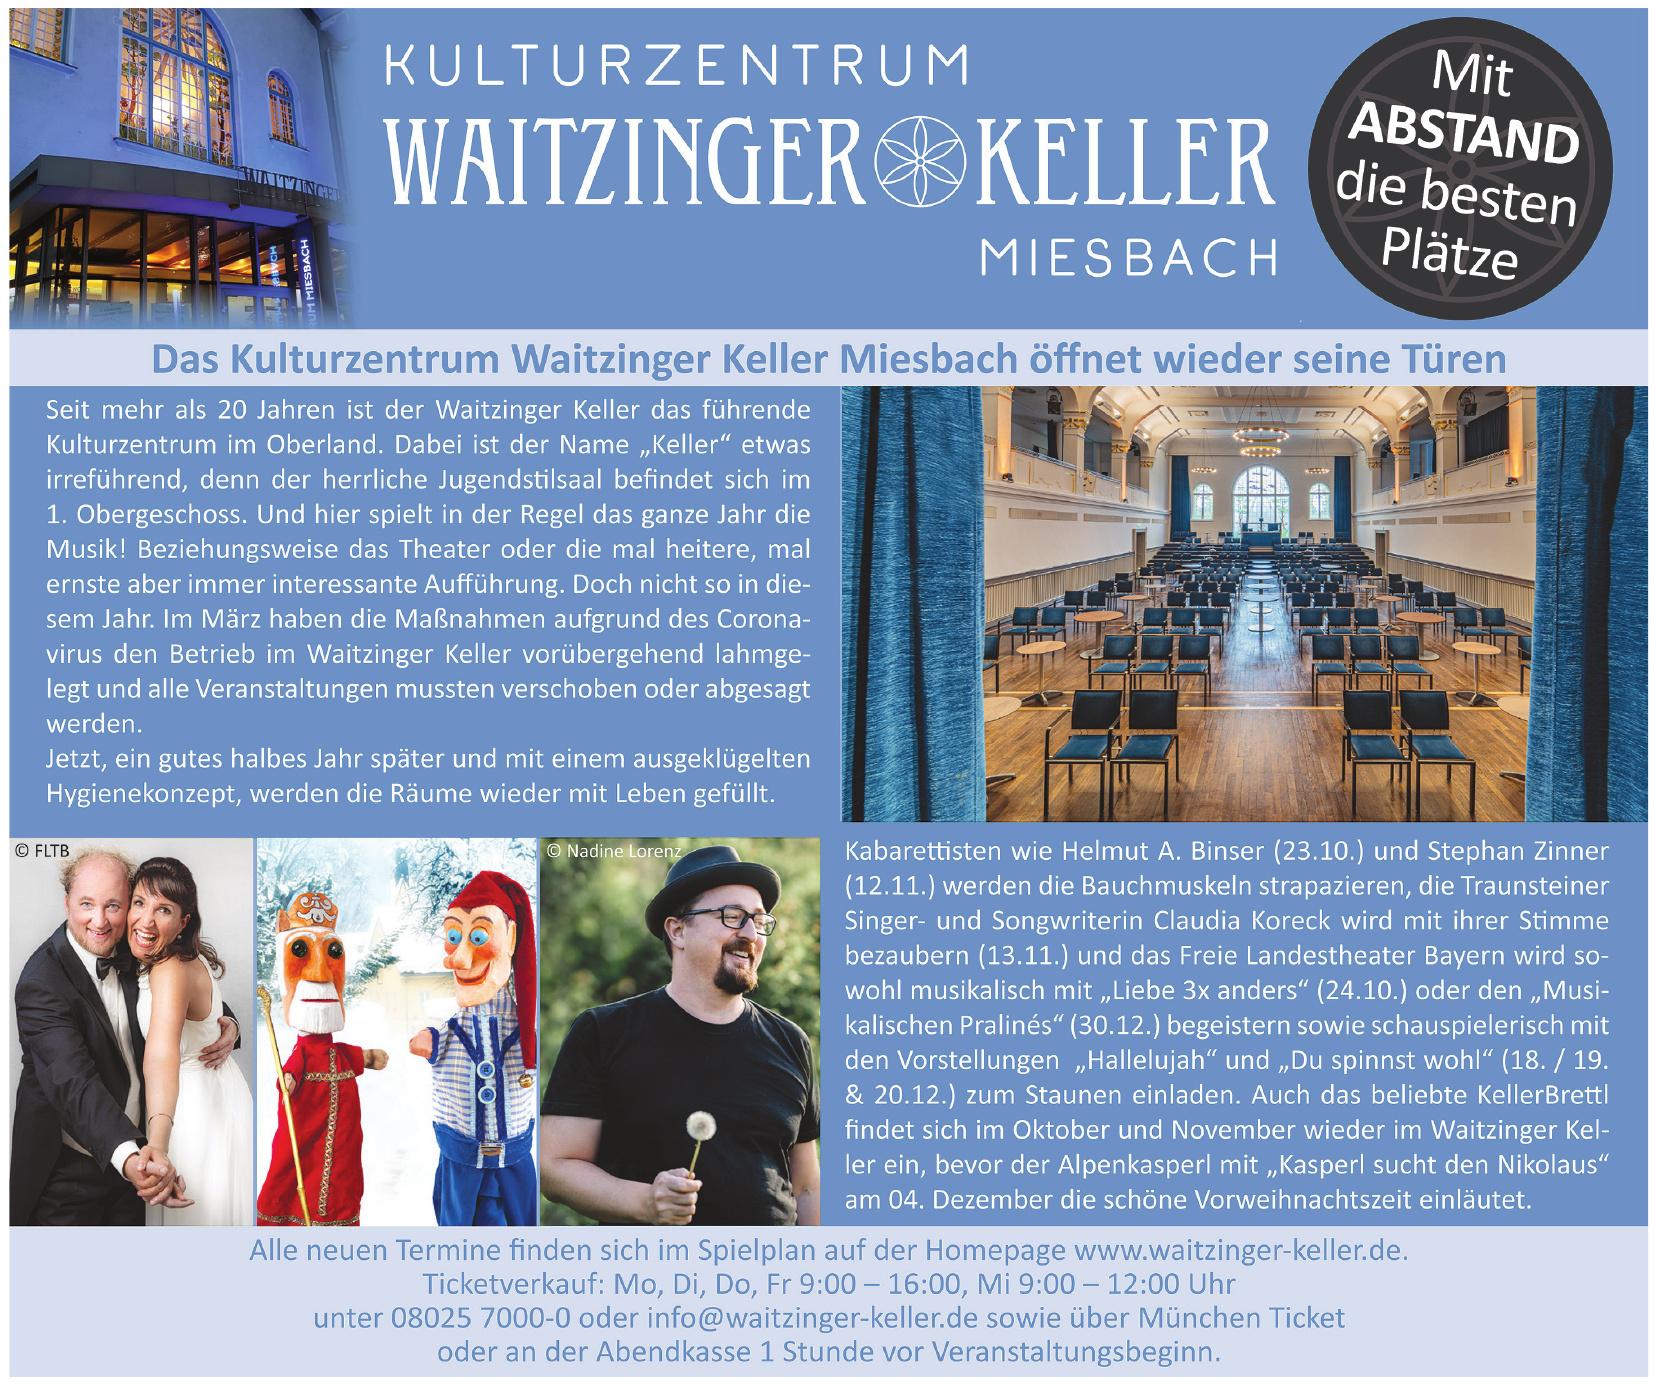 Waitzinger Keller Miesbach